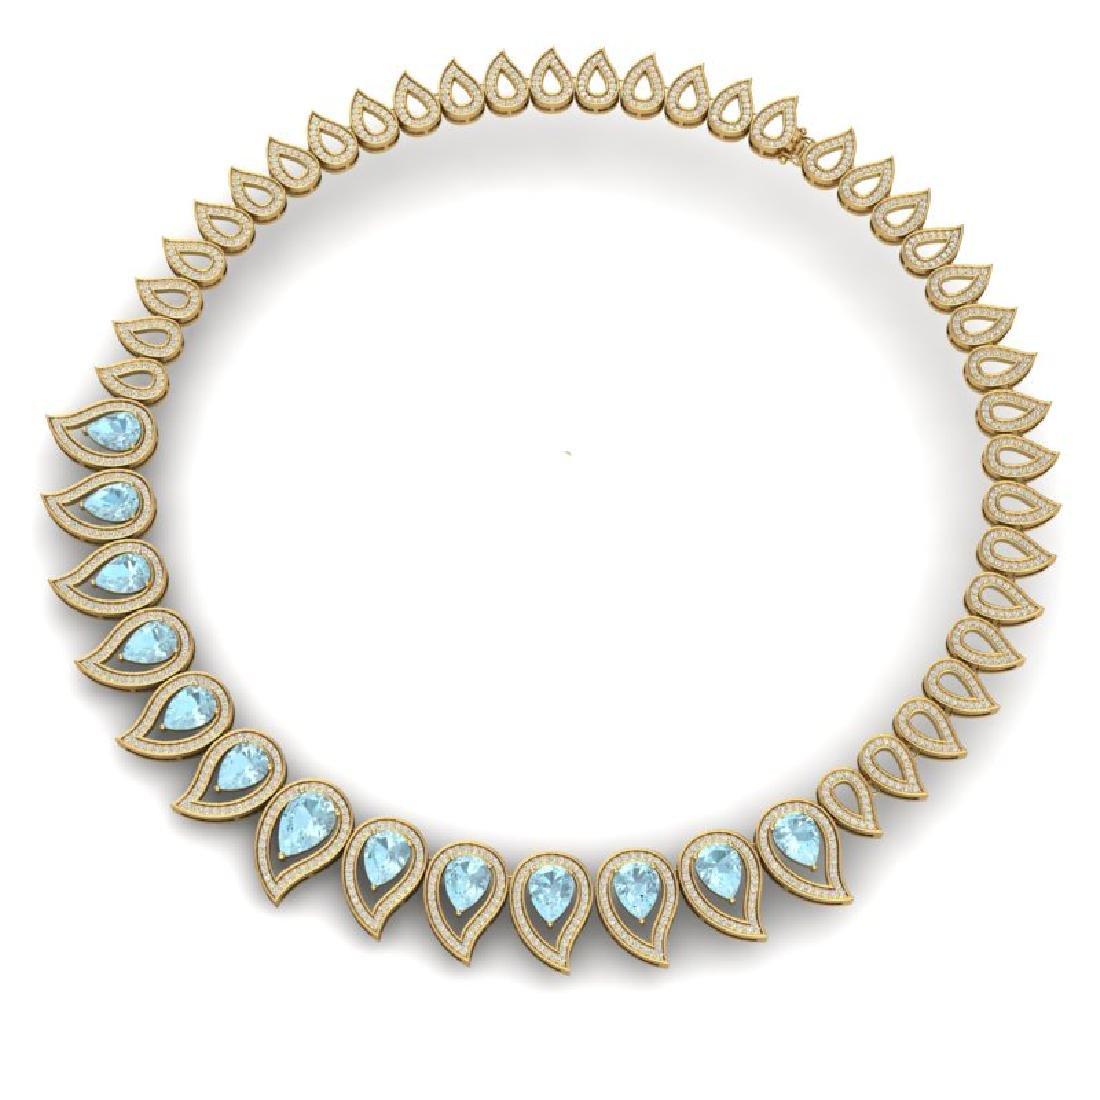 34.96 CTW Royalty Sky Topaz & VS Diamond Necklace 18K - 3